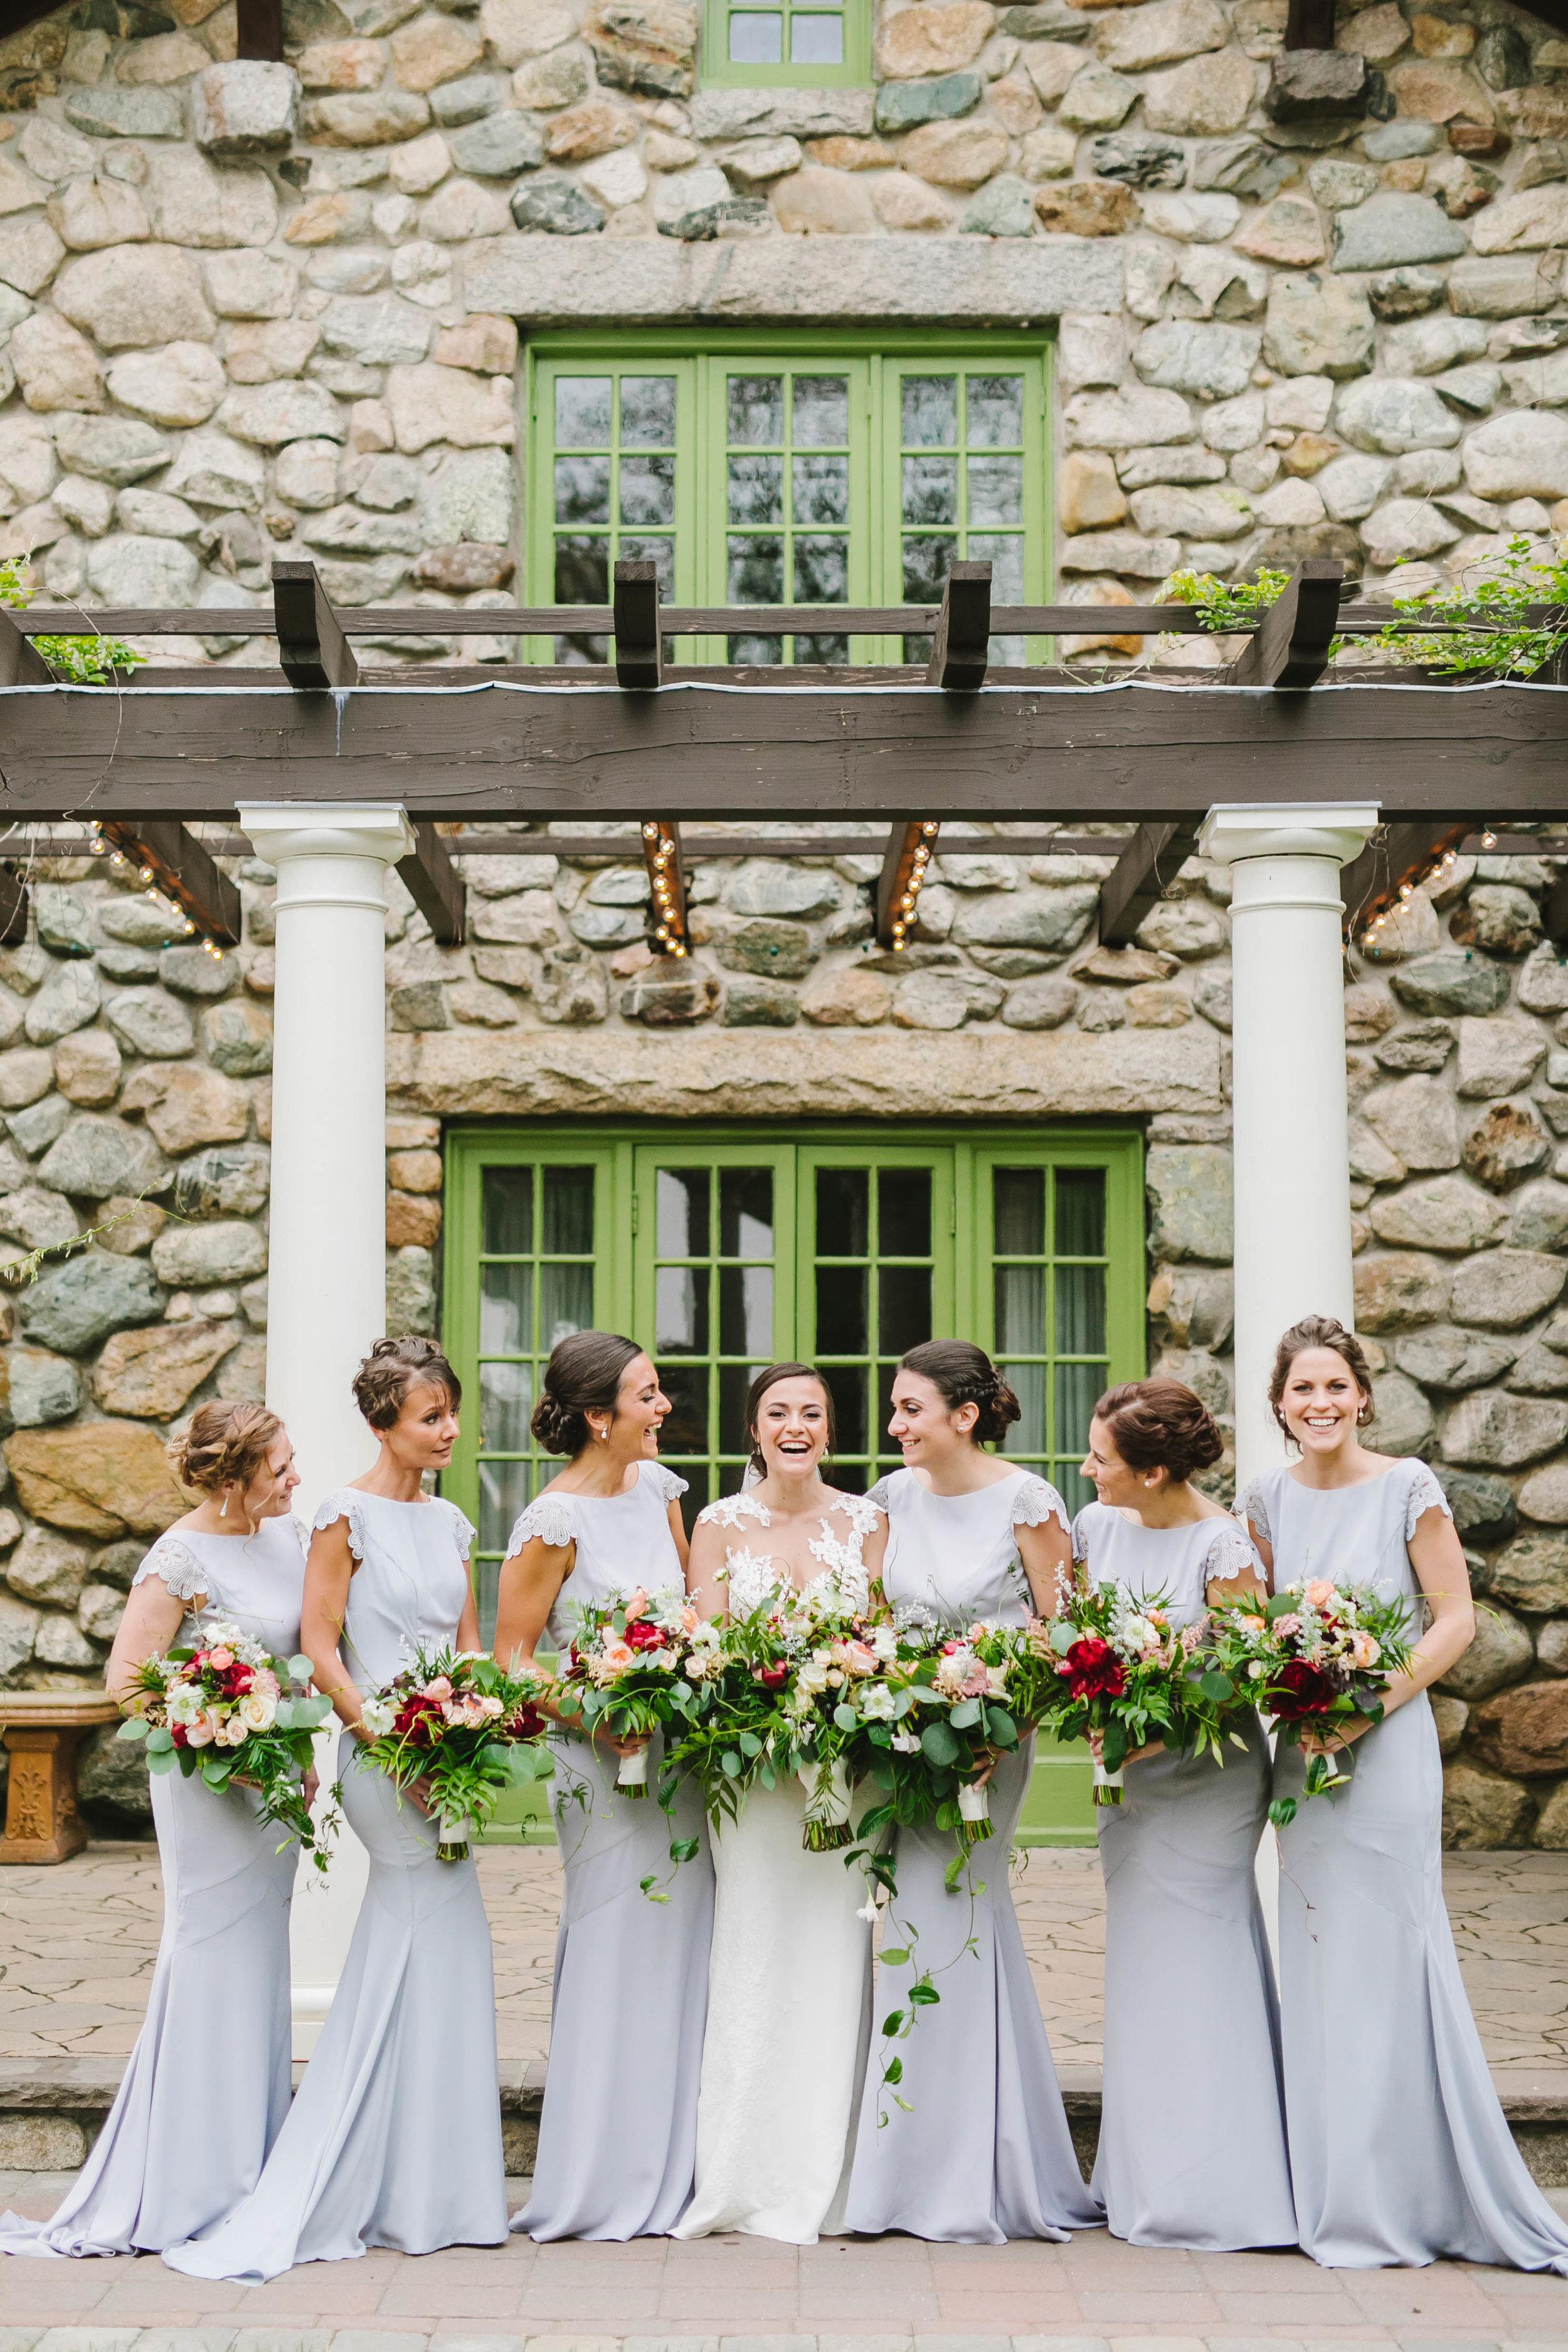 Willowdale Estate Wedding Boston Topsfield MA Italian Garden mansion house wedding - Emily Tebbetts photography-9.jpg